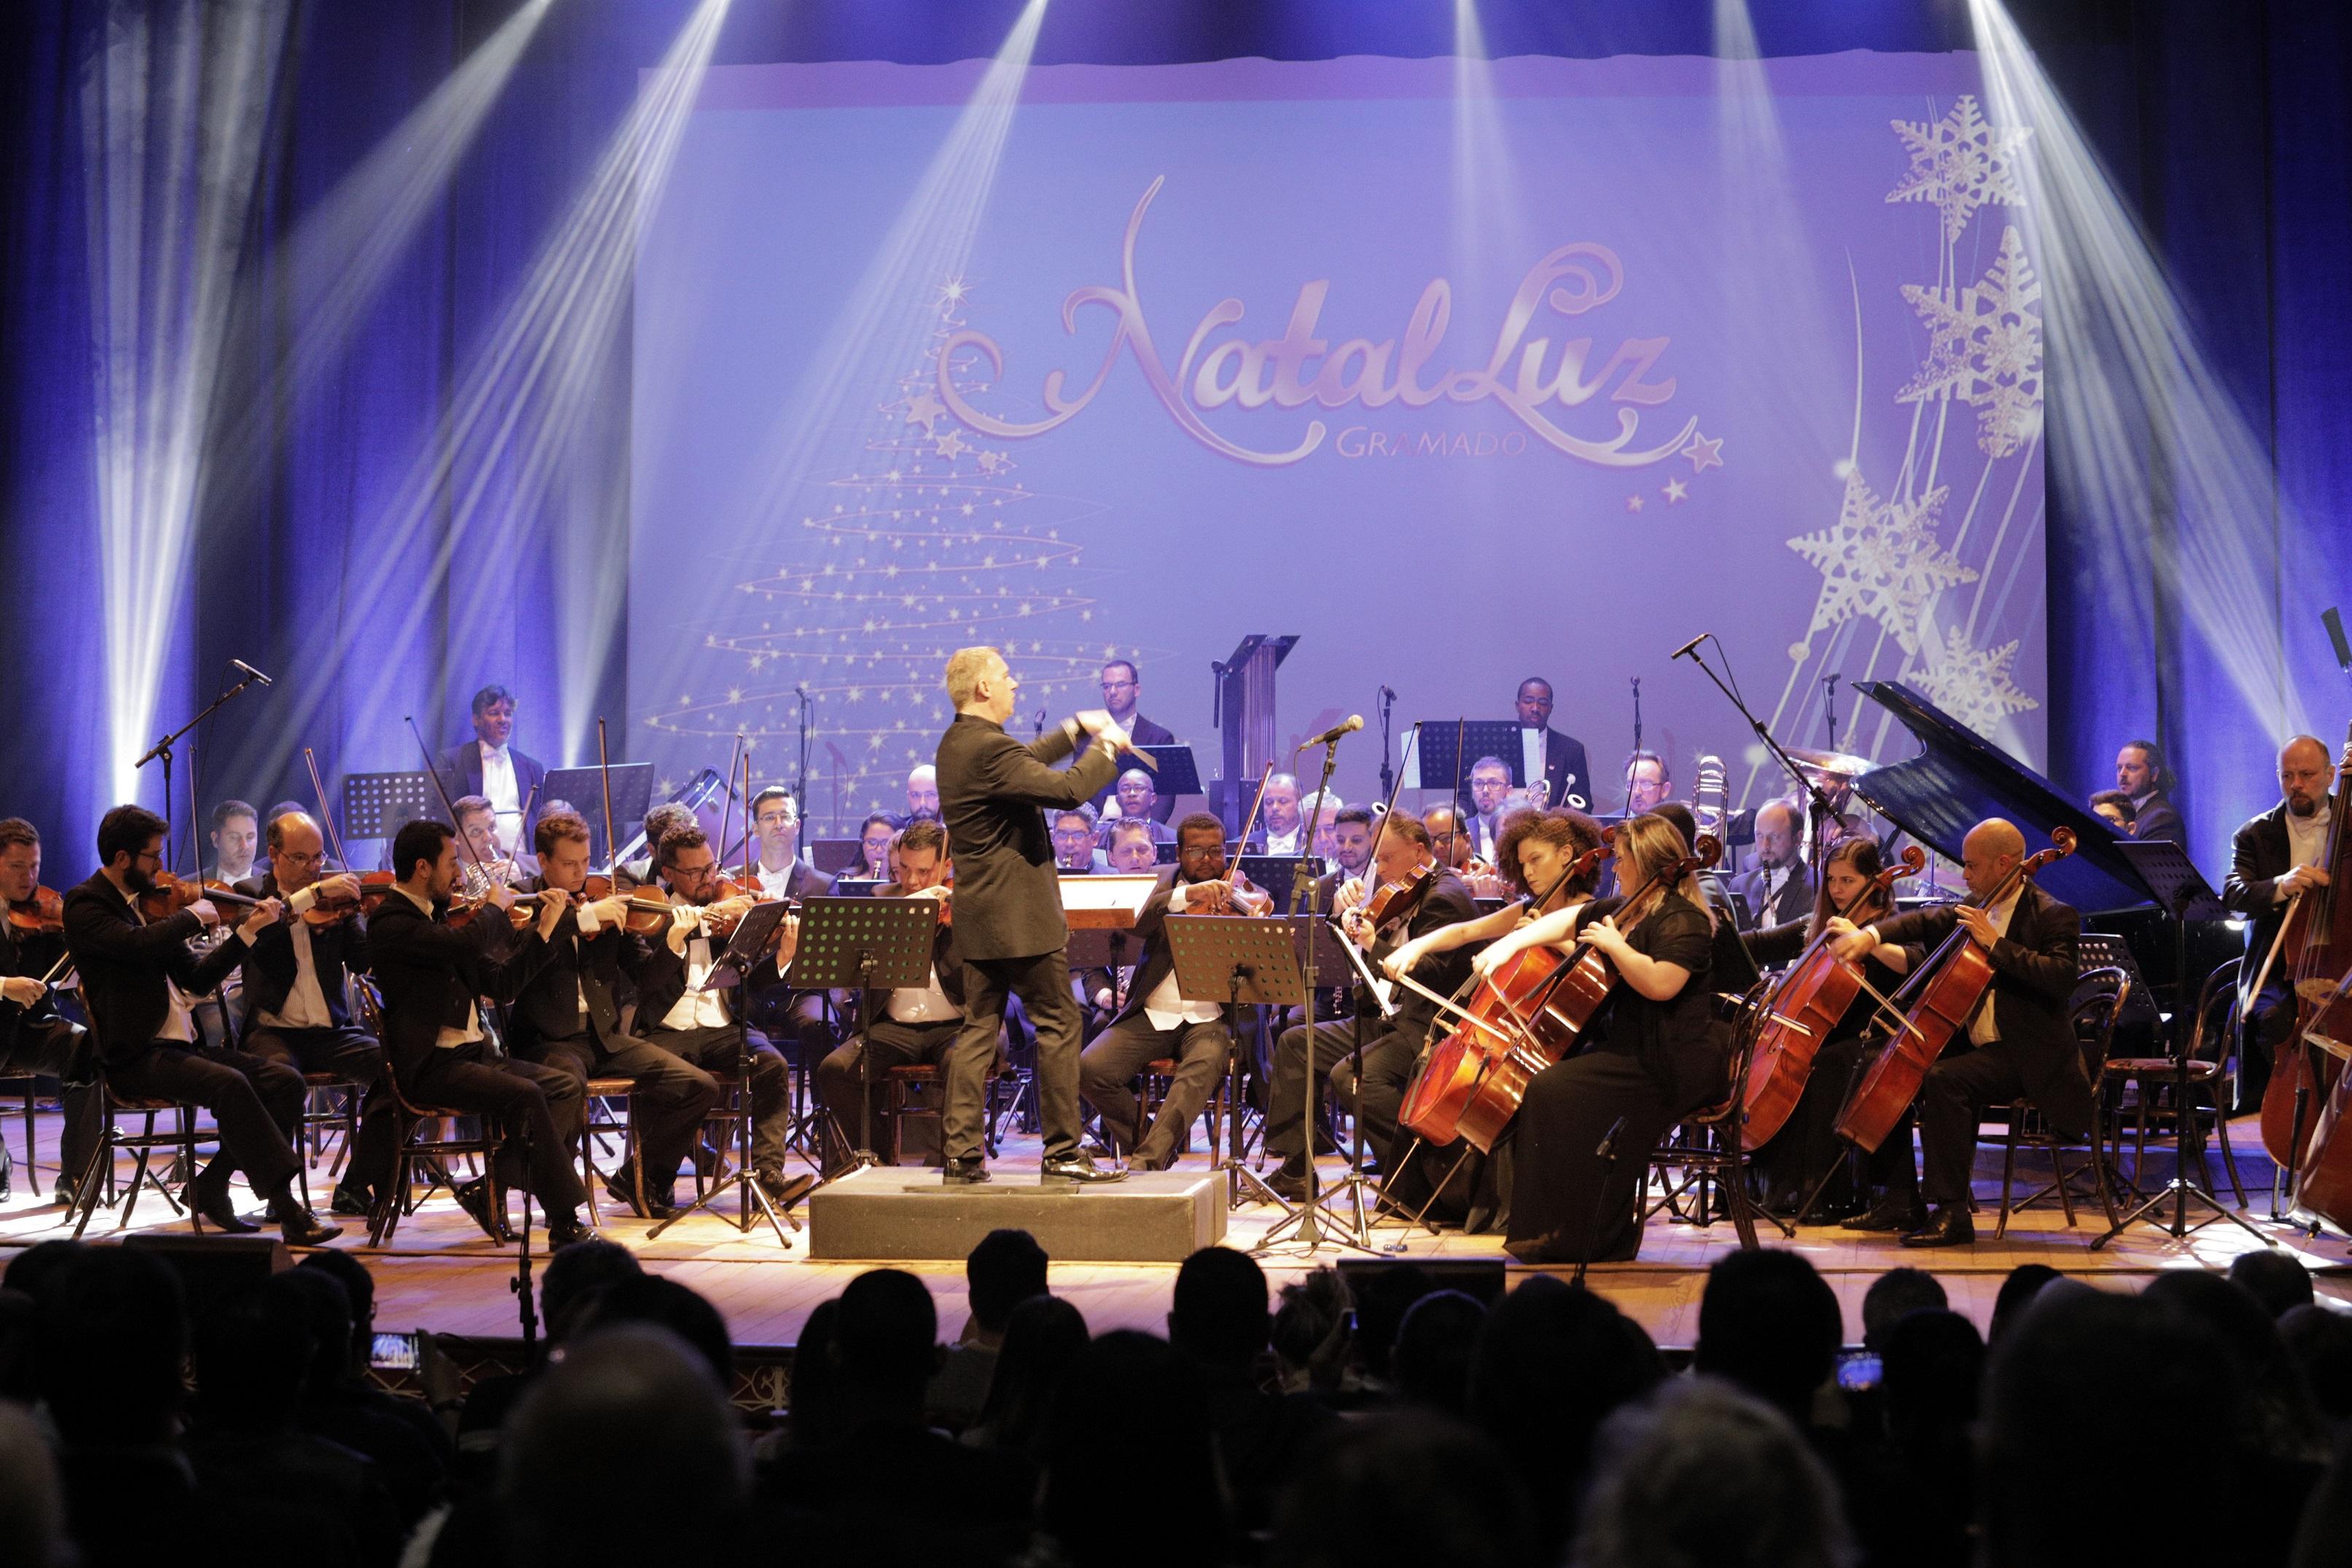 Foto orquestra sinfonica de gramado